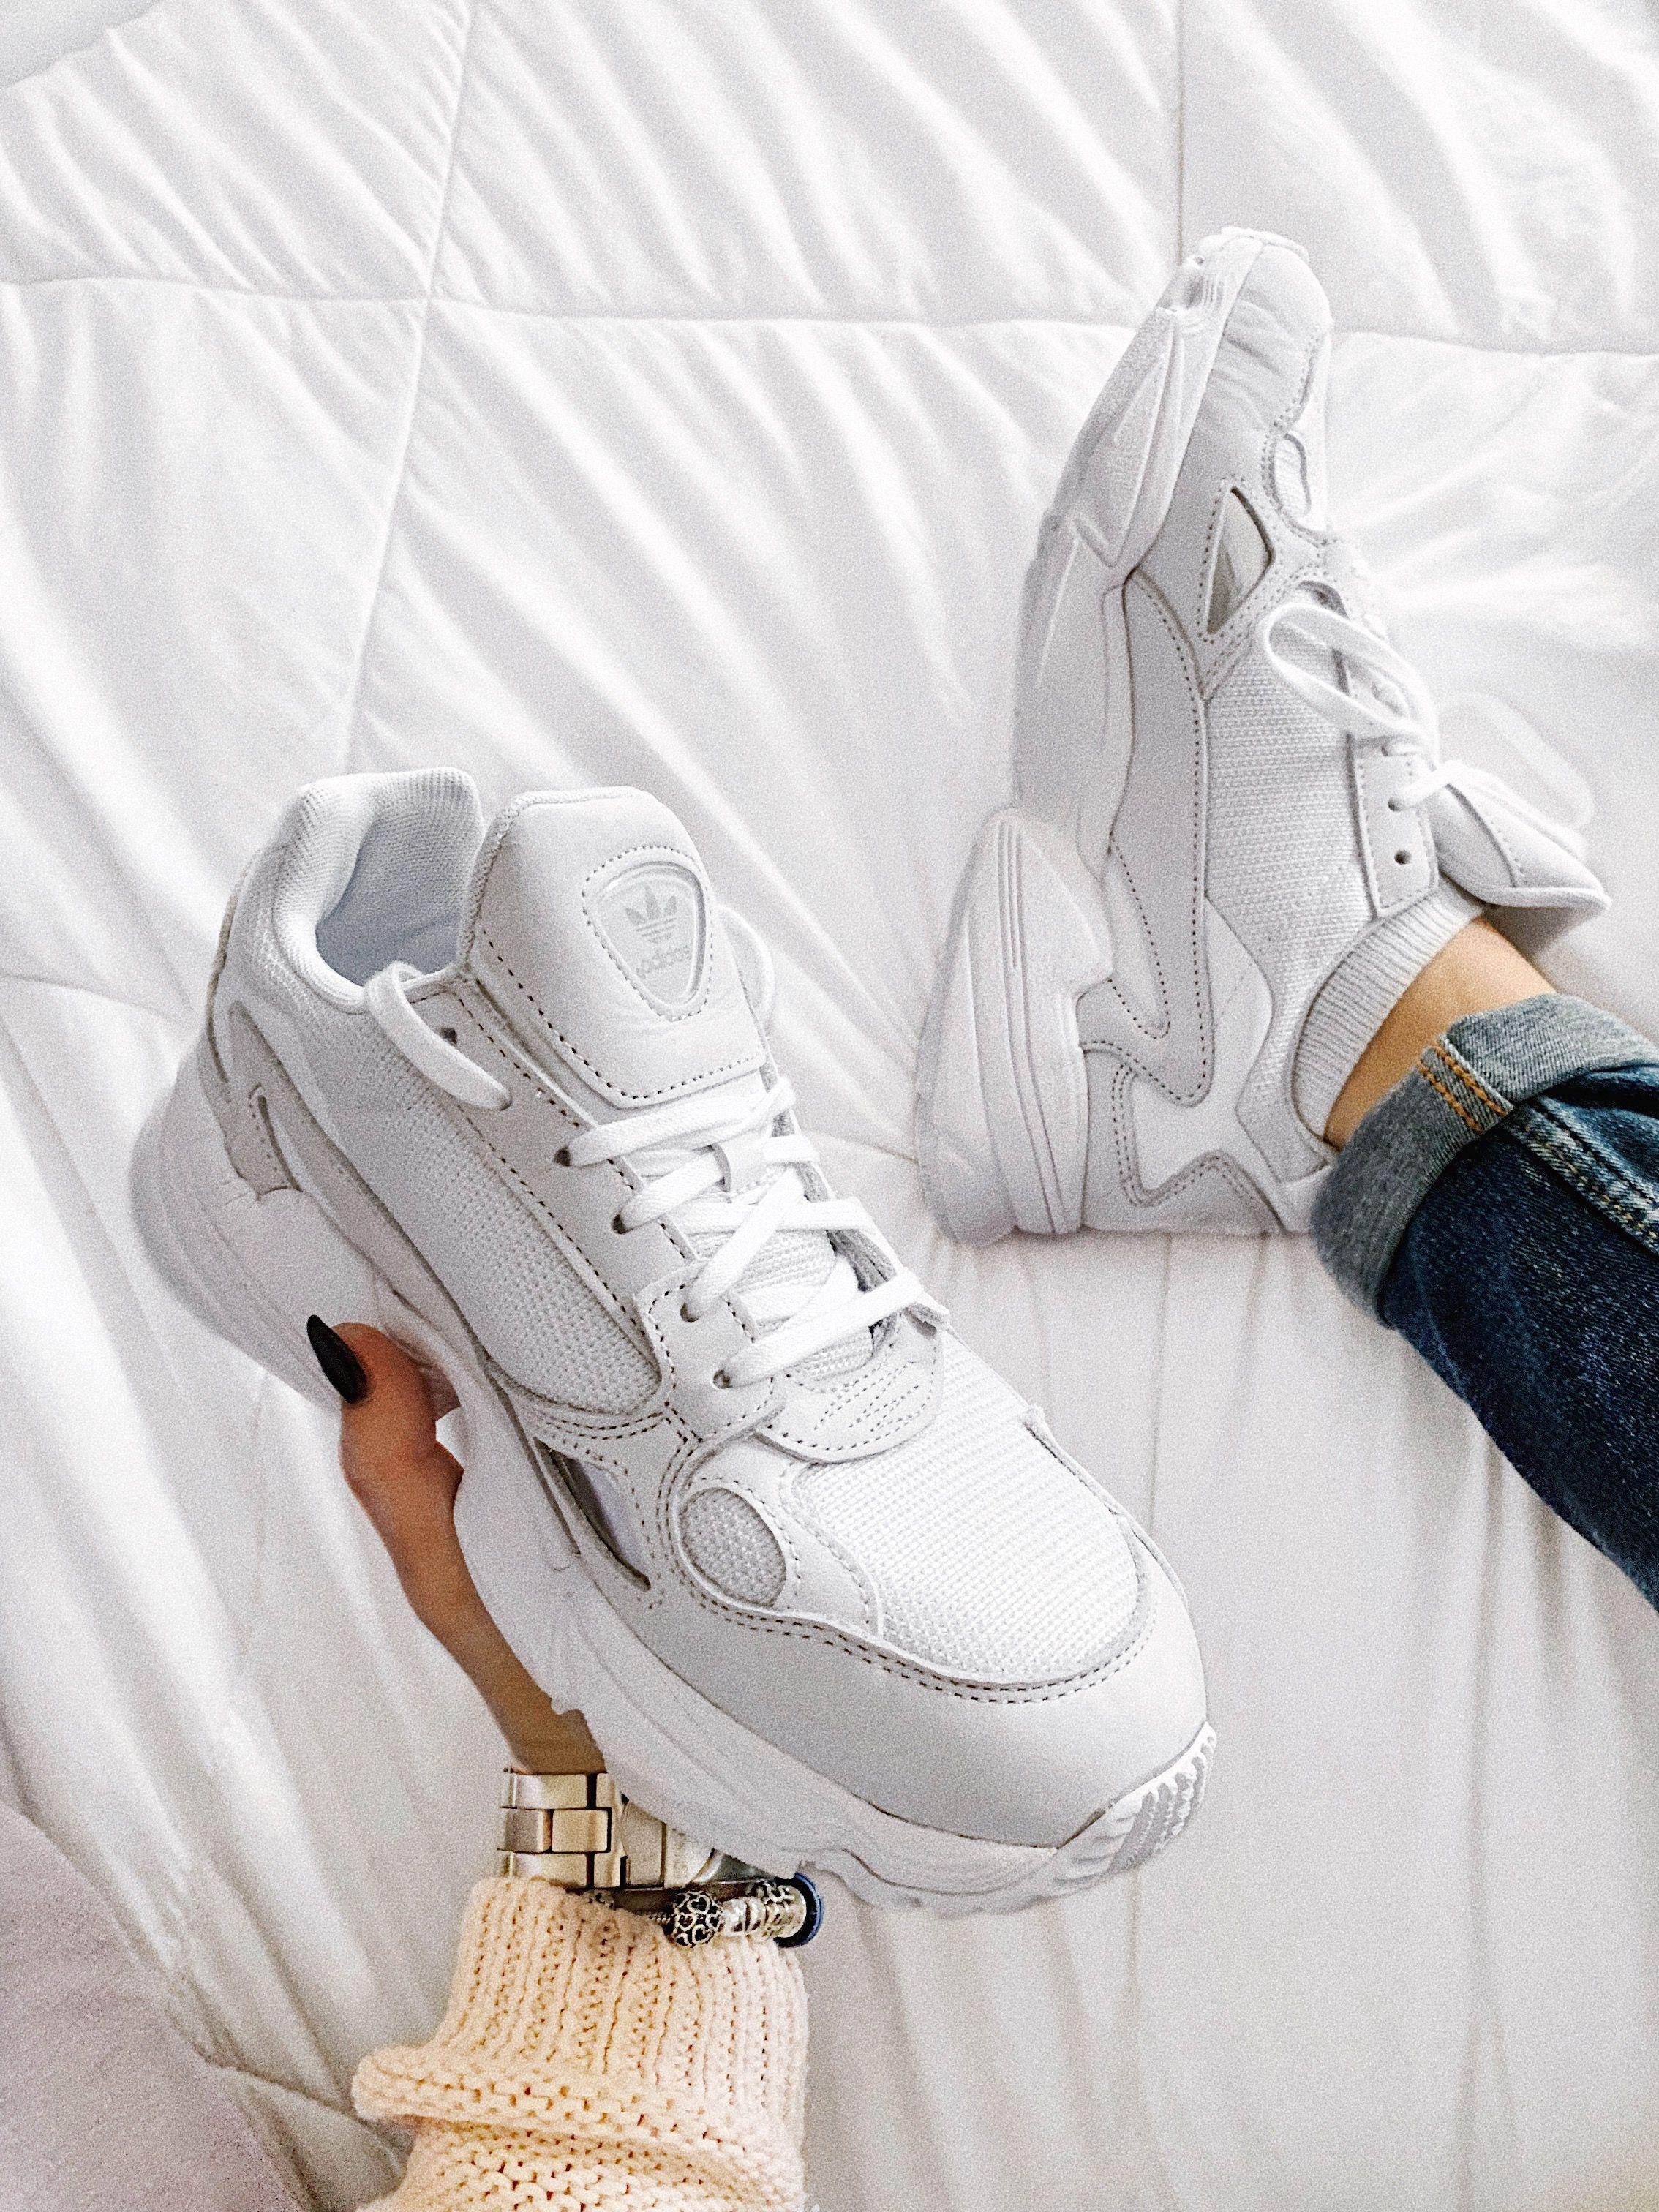 Chaqueta Interpersonal literalmente  Adidas Falcon | Sneakers nike, Cute shoes, Sneakers